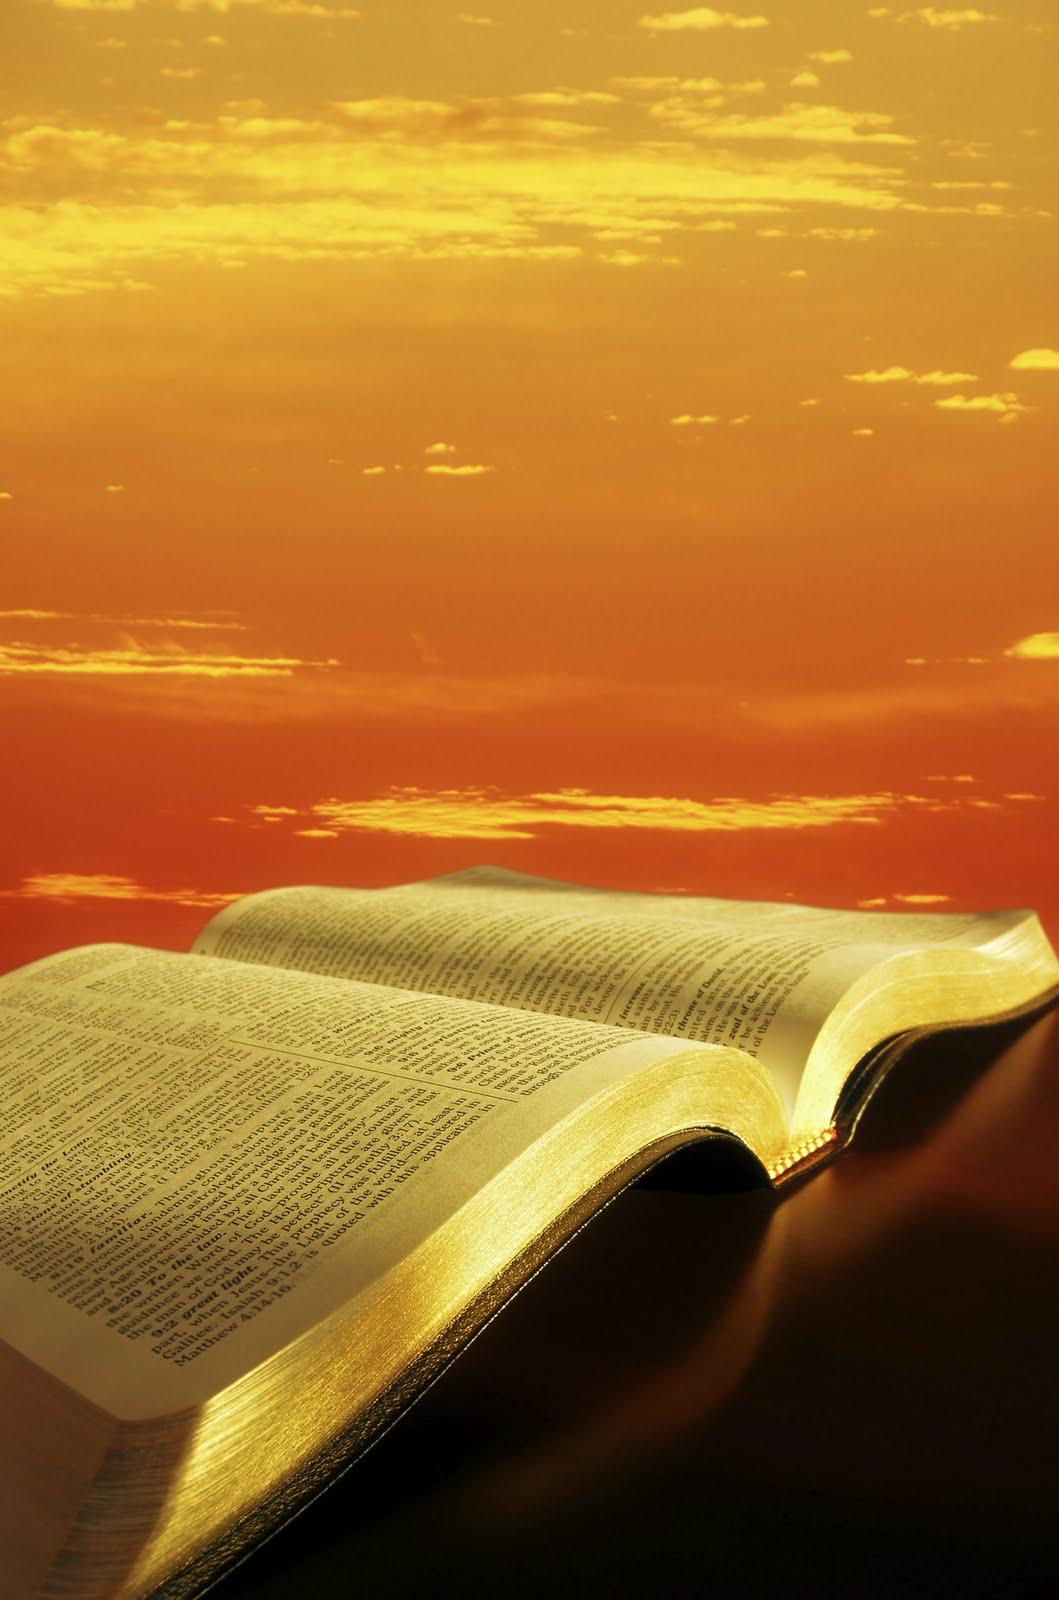 http://3.bp.blogspot.com/_l0Jv-SLk81k/TL-fYNTpCdI/AAAAAAAAD1M/42f6PY69cnA/s1600/BIBLE.jpg